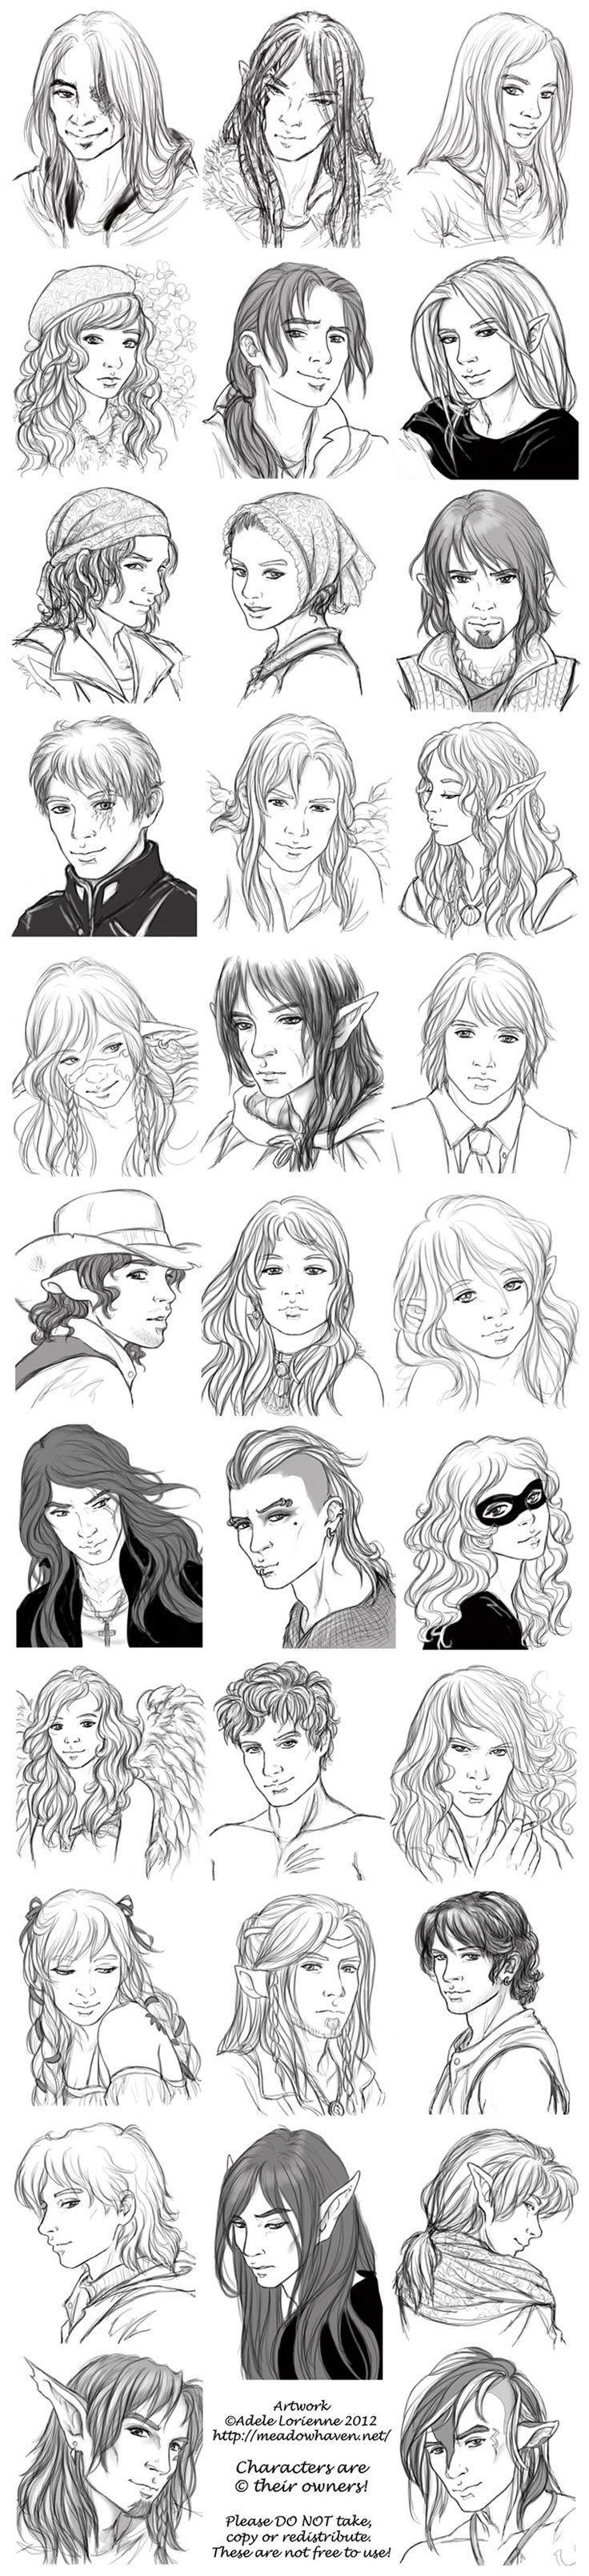 Hairstyles Cartoon Characters